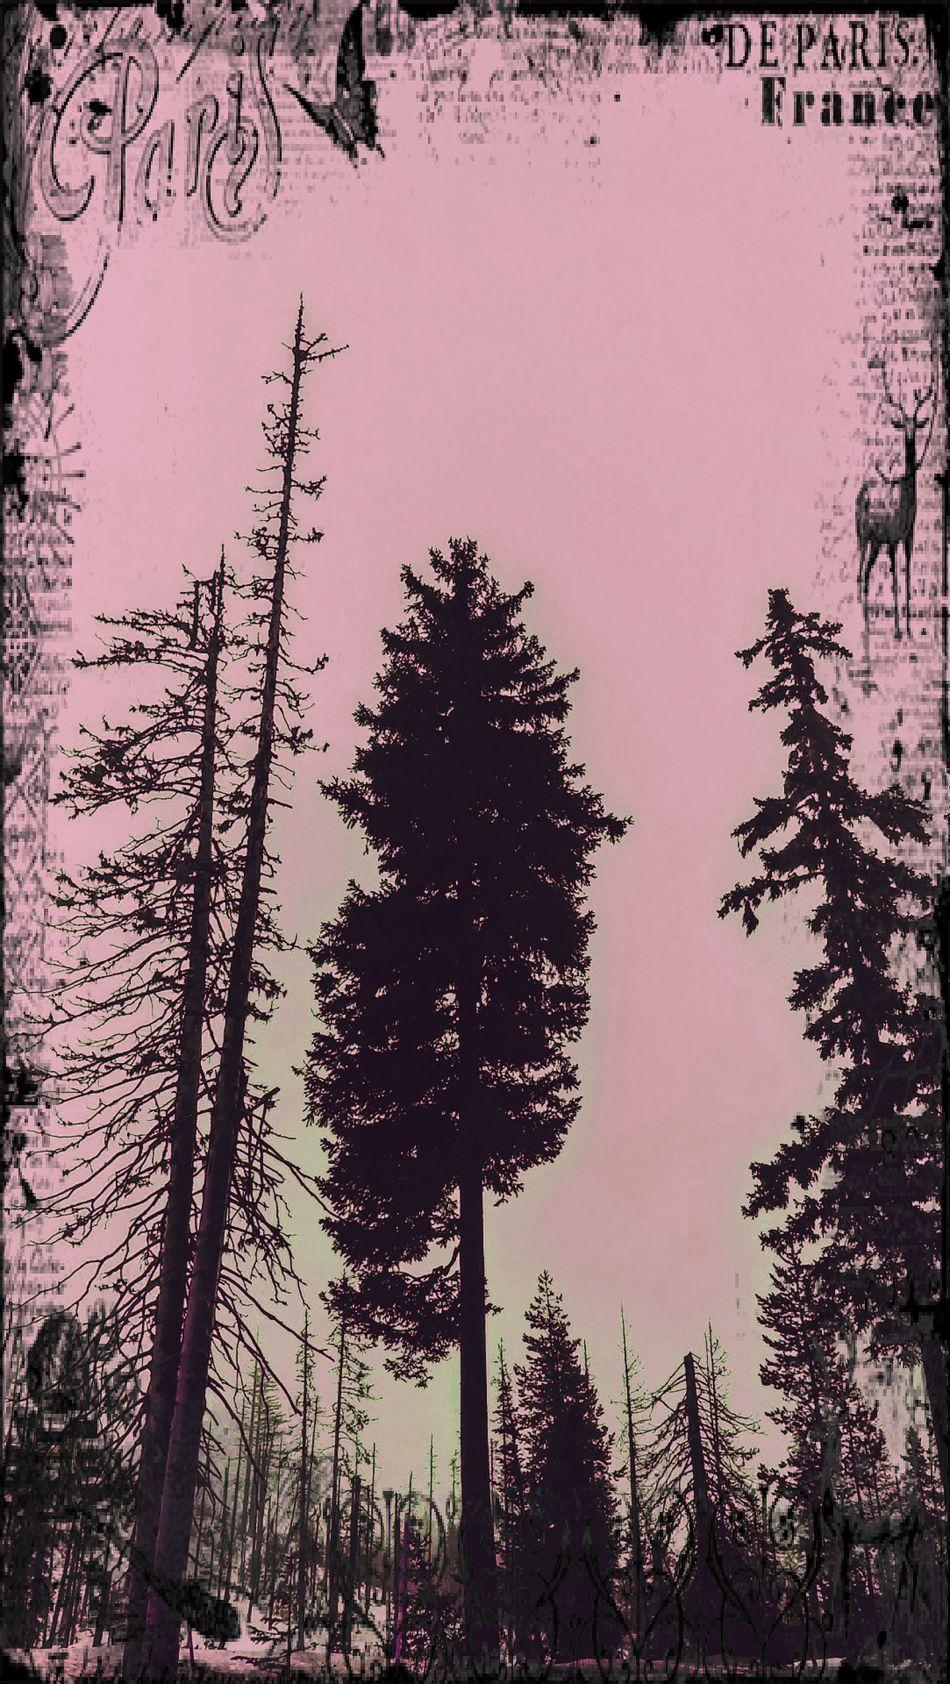 🌸🌷 Pastel Power 🌸🌷 Paris, France  Eye4photography  EyeEm Trees This Week On Eyeem Eyeem Mother Nature Shades Of Nature Shades Of The Sky Shades Of Sky Eyeem Clouds And Sky Pastel Colors Treescapes Shades Of Pink EyeEm Best Shots - Nature Trees In Winter Pink Sky Vintage Filter EyeEm Tree Collection EyeEm Worthy EyeEm Gallery Soft Pastel